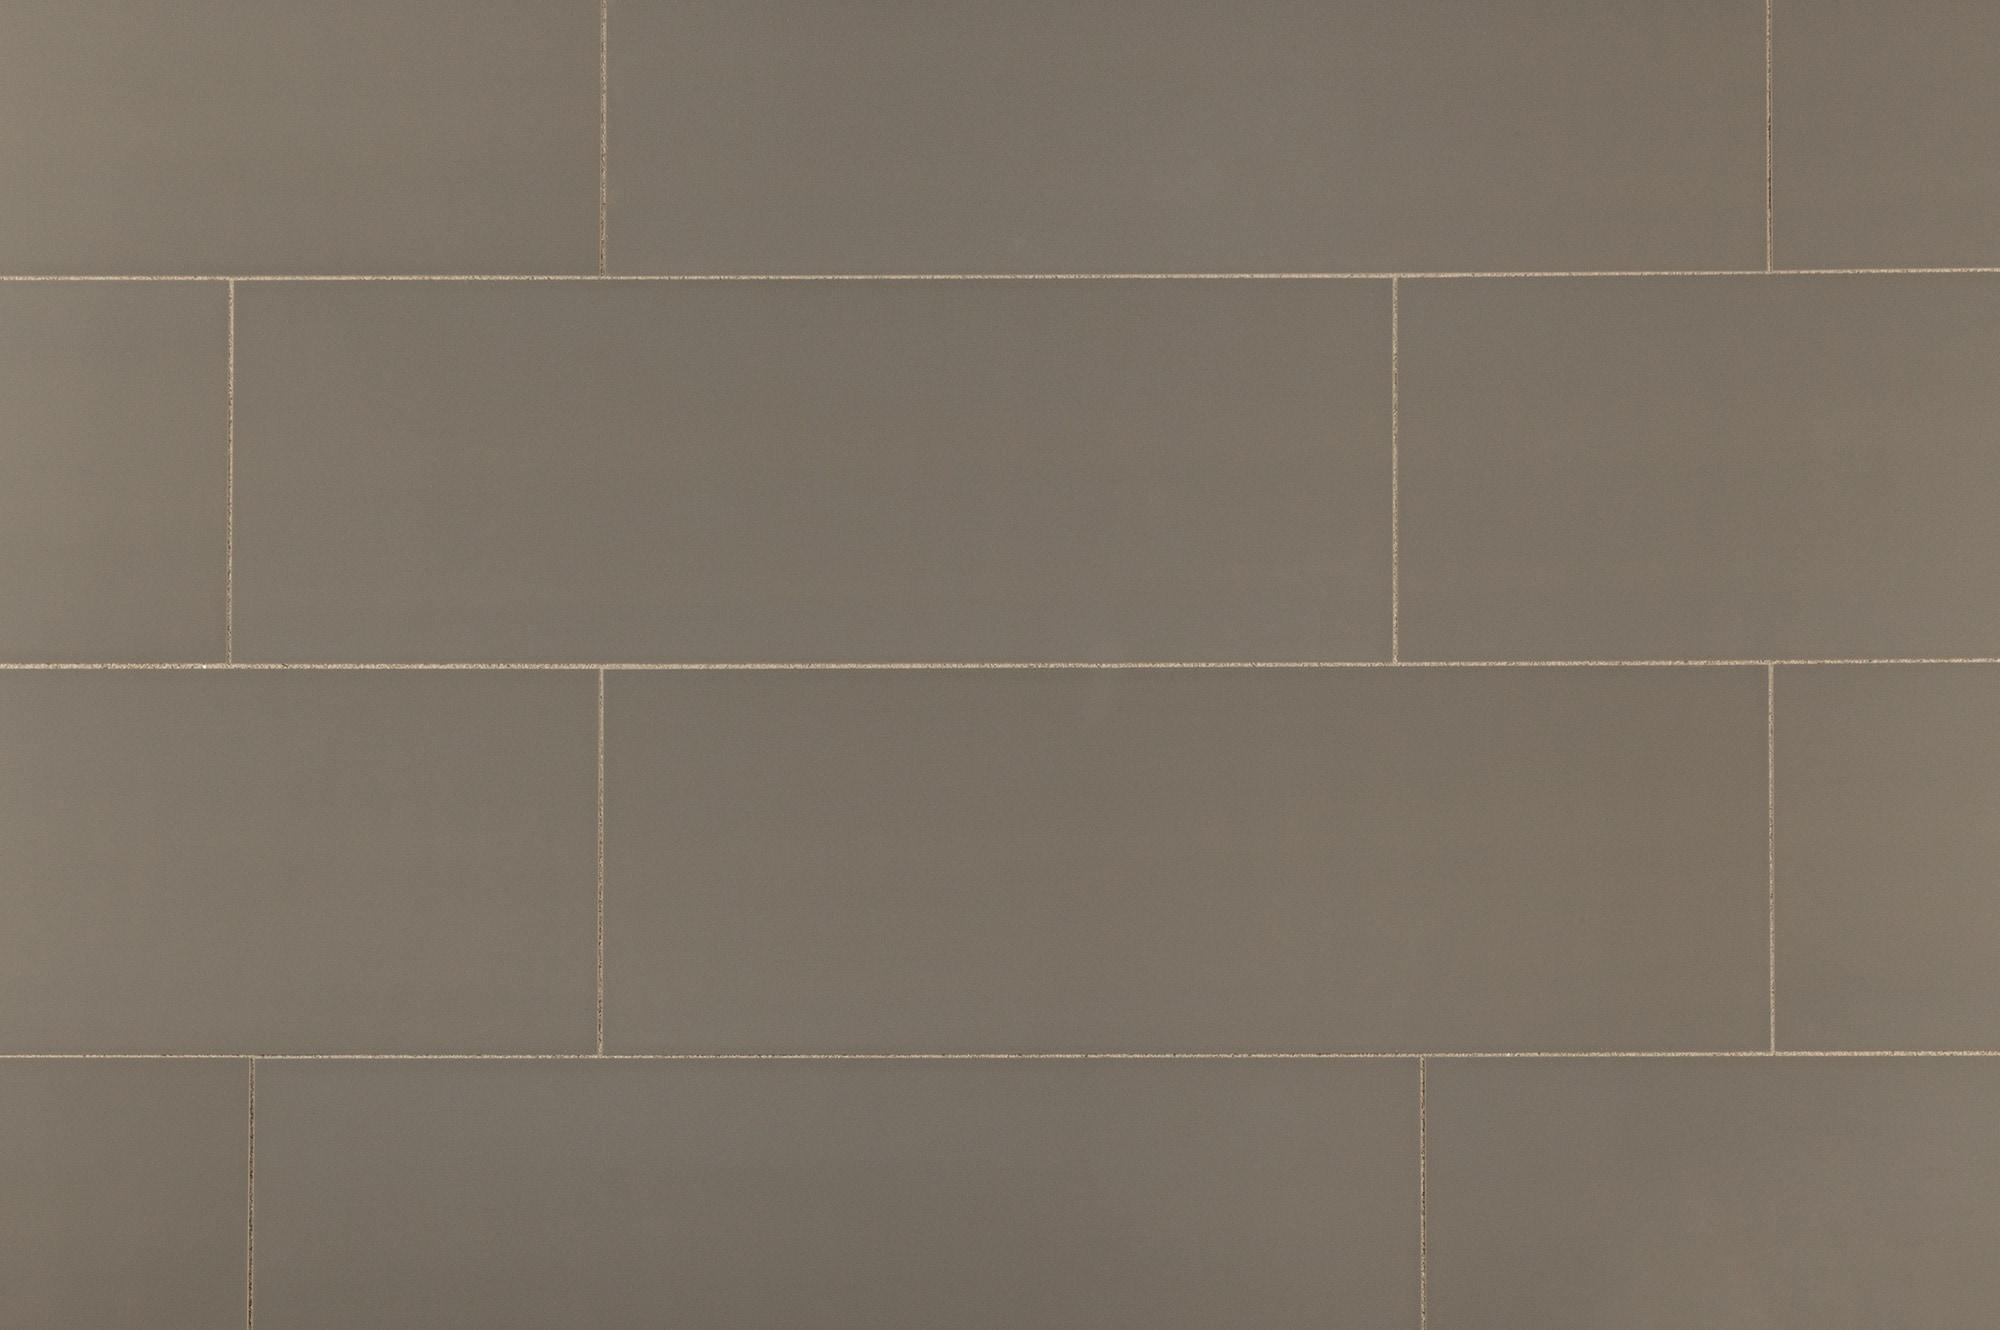 Alzatina Ceramic Wall Tile Panel Collection Gray Urban 12 X36